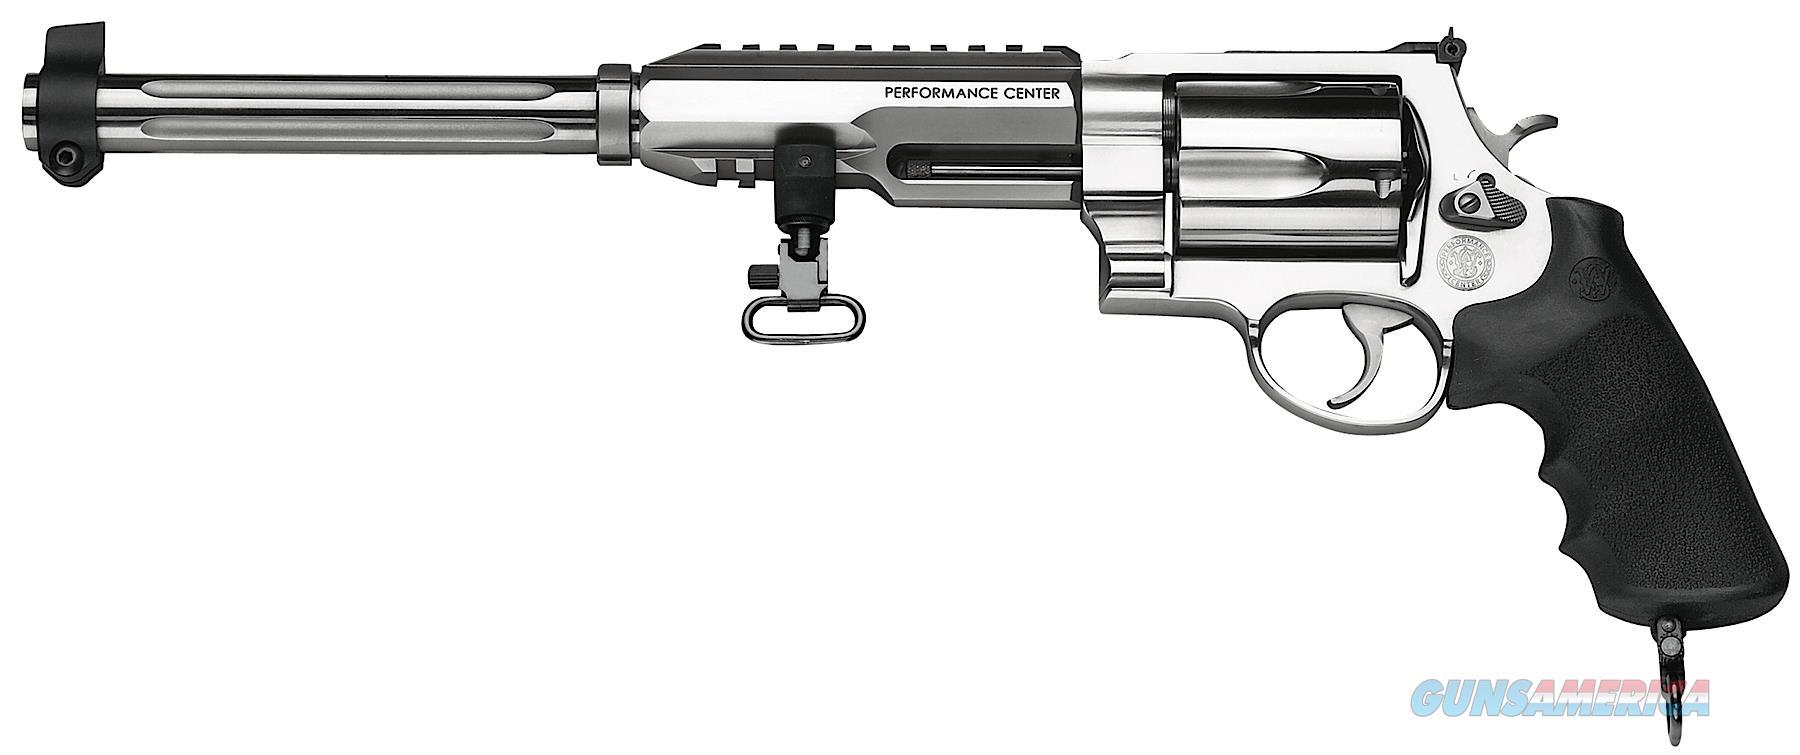 Smith & Wesson 460, S&w M460xvr    170280 Pfmc  460 12     Ss  Guns > Pistols > 1911 Pistol Copies (non-Colt)